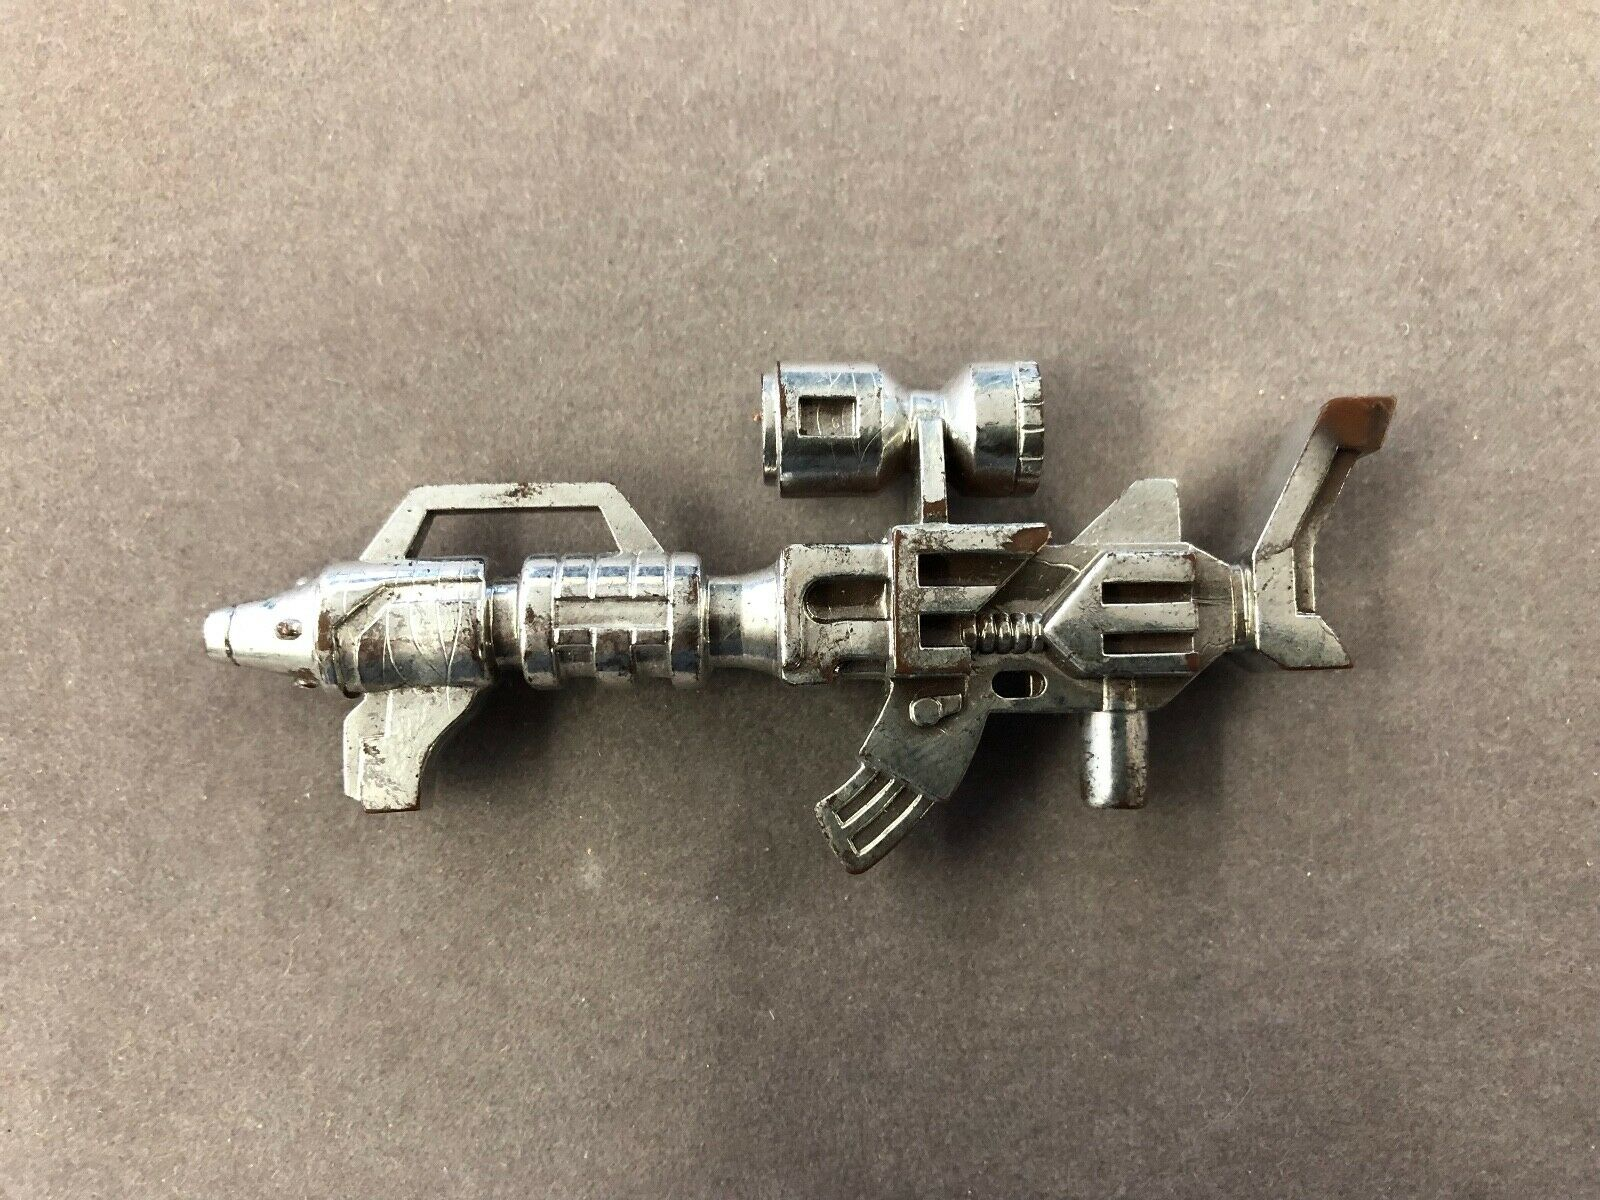 Transformers Takara Microchange MC-11 44 Magnum Original Gun Vintage RARE